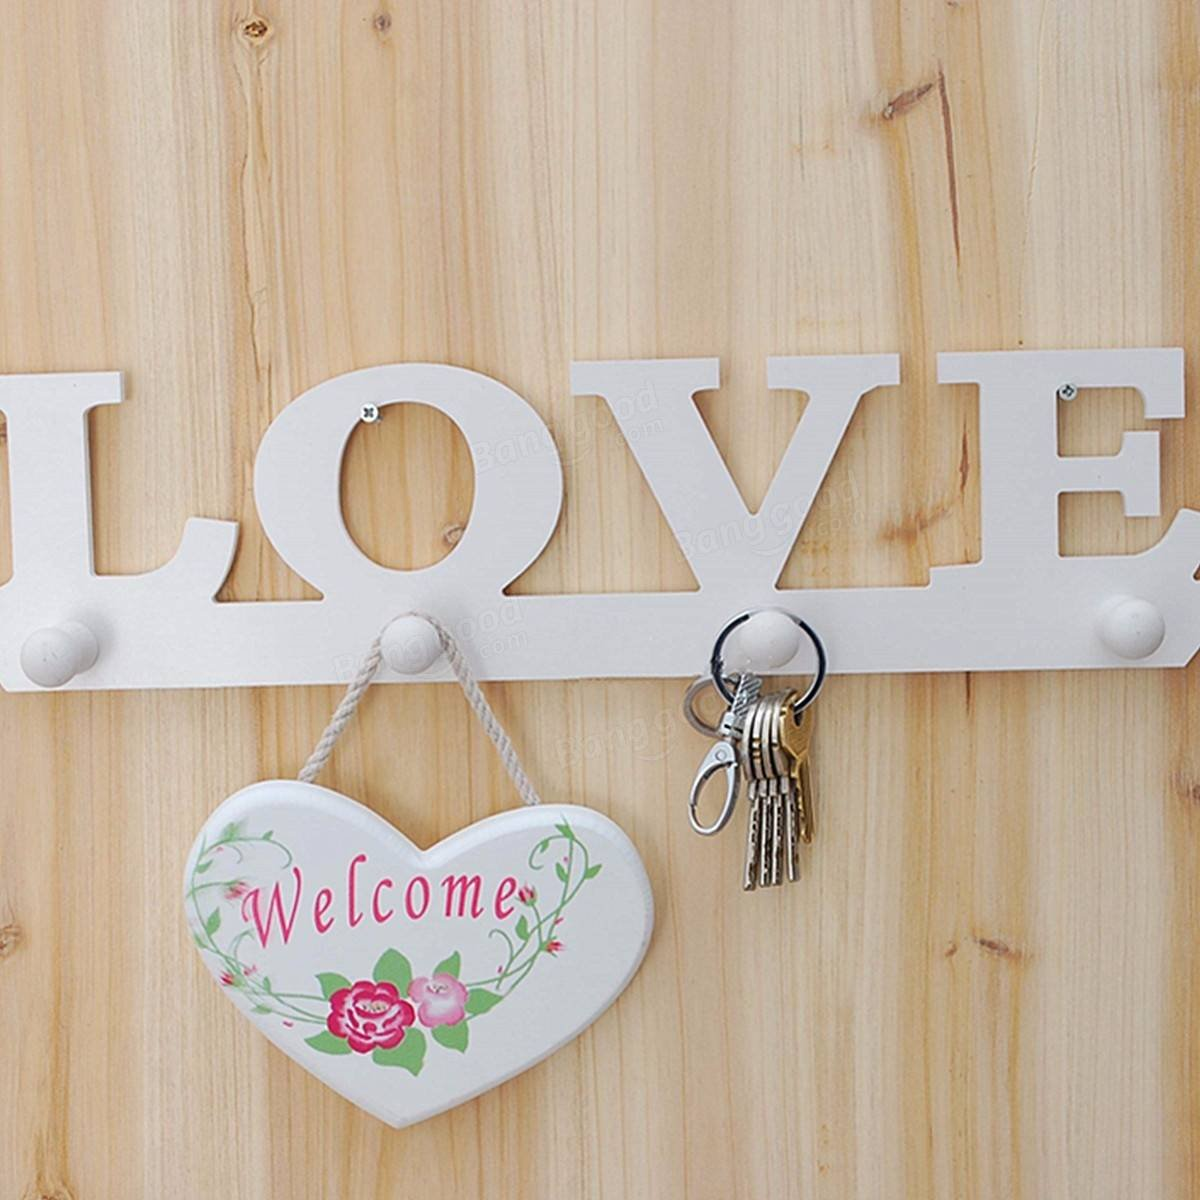 Gown Bait - Creative Vintage White Love Robe Hook Cloth Holder Sundry Hanger Wall Decor - Knock Shot Sweetener Mitt Come-On Vest Lure Crotchet Mauler - 1PCs